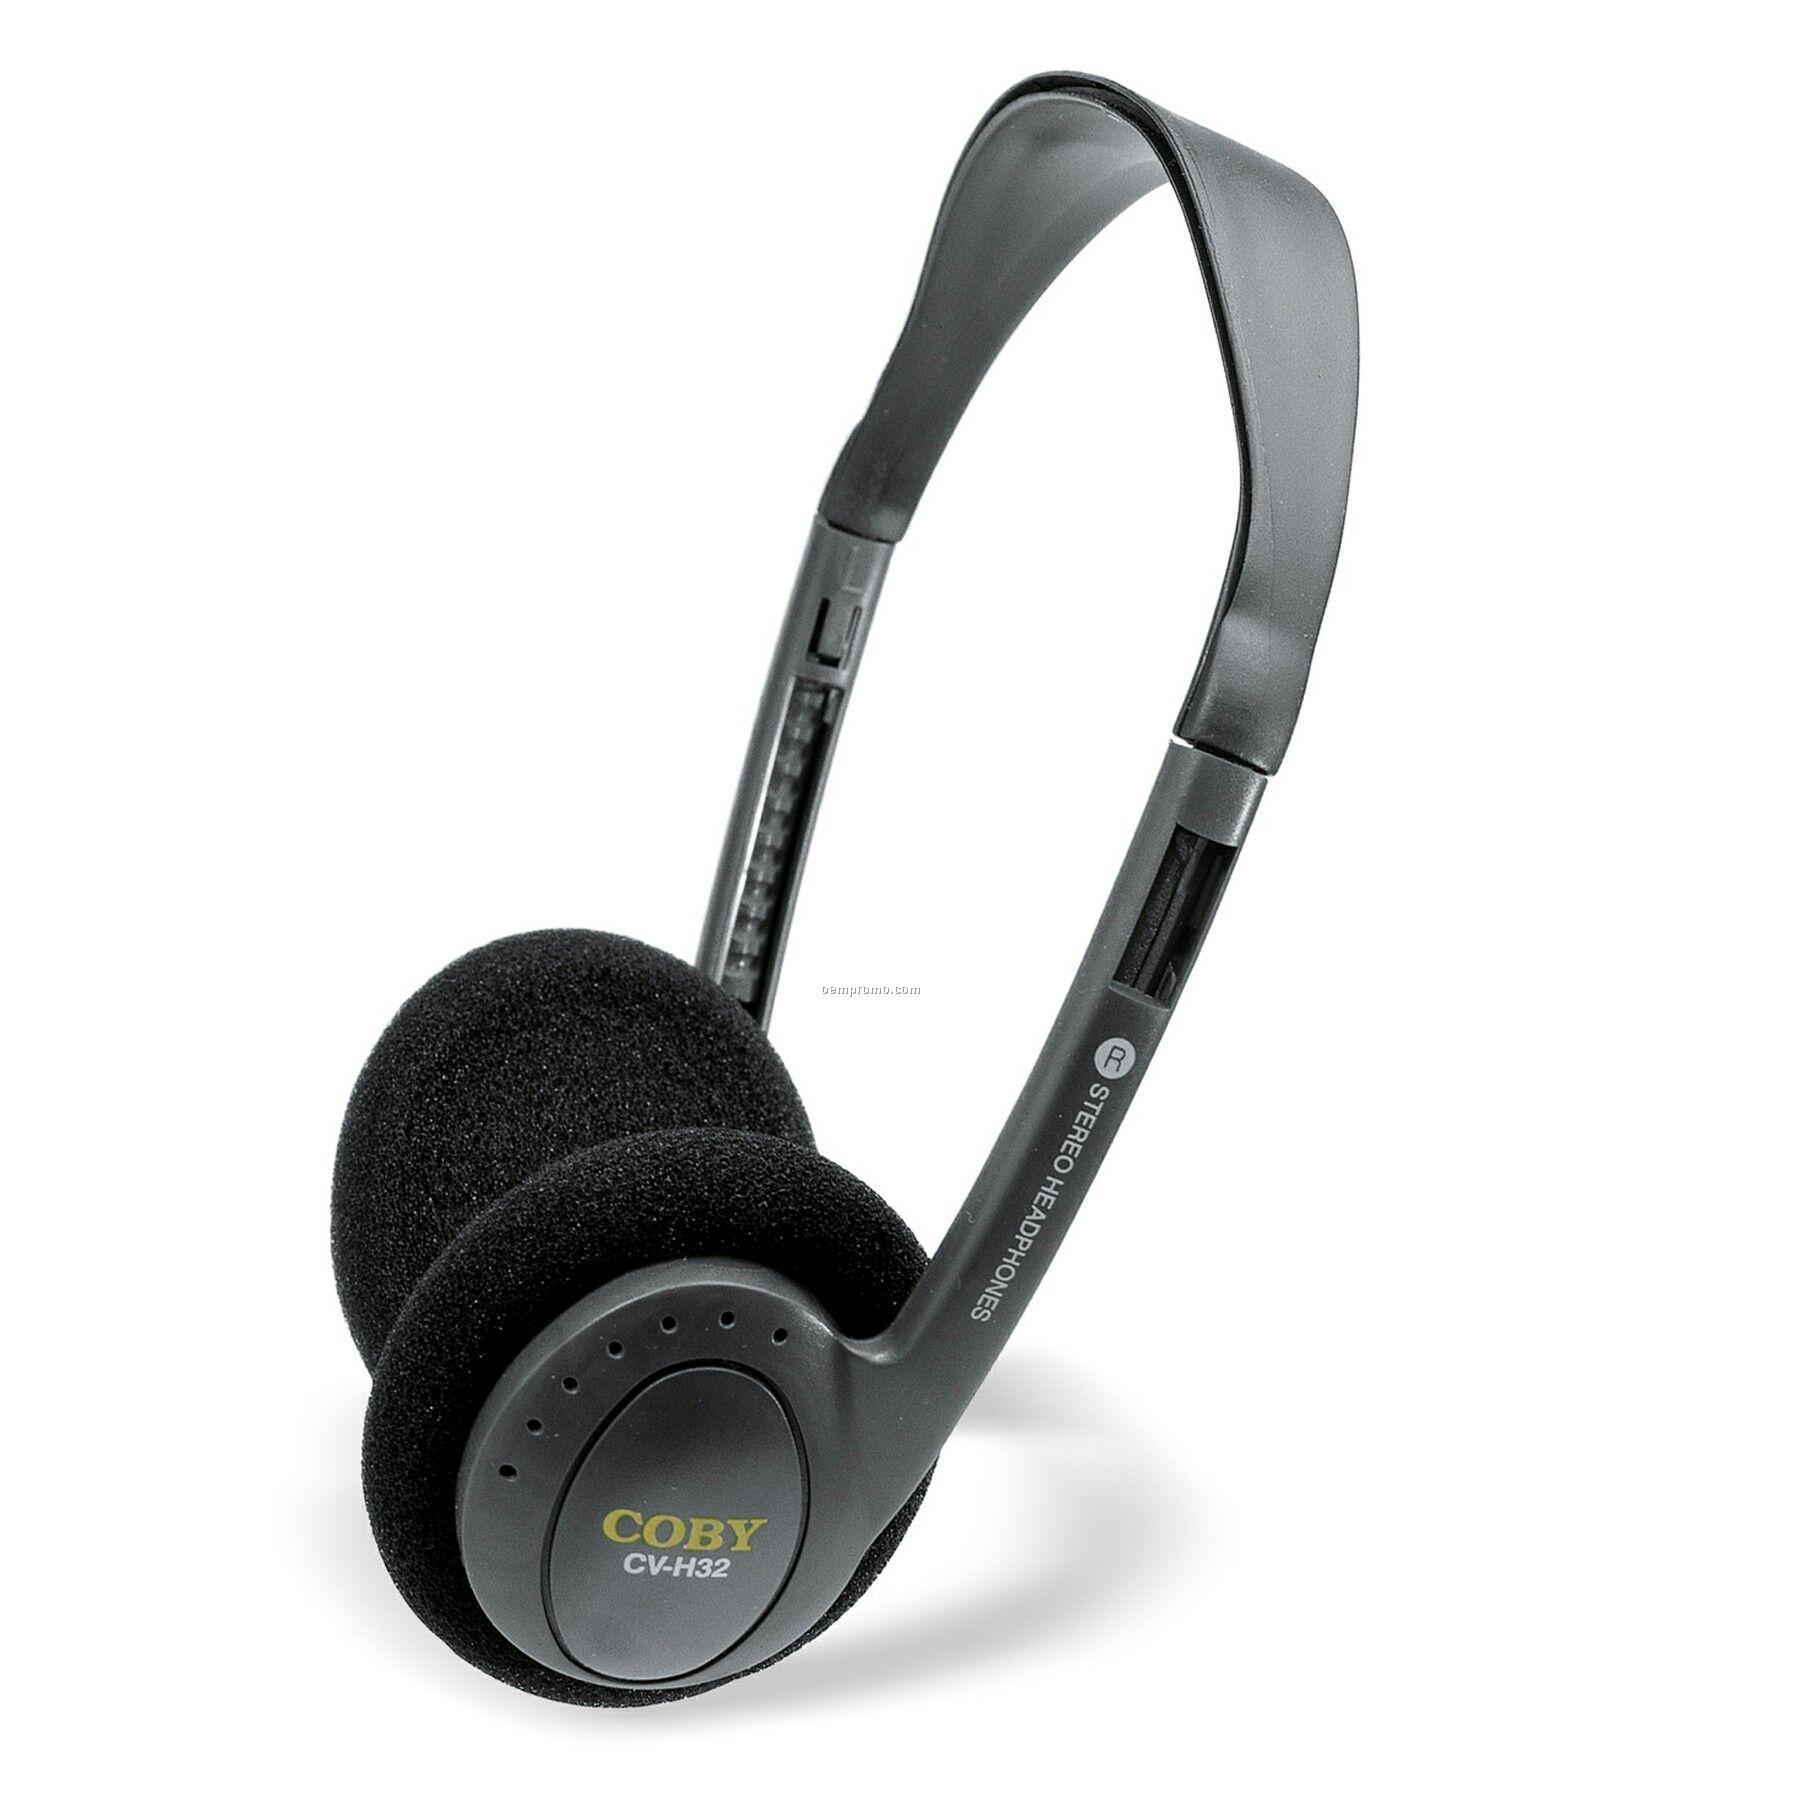 Lightweight Stereo Headphones